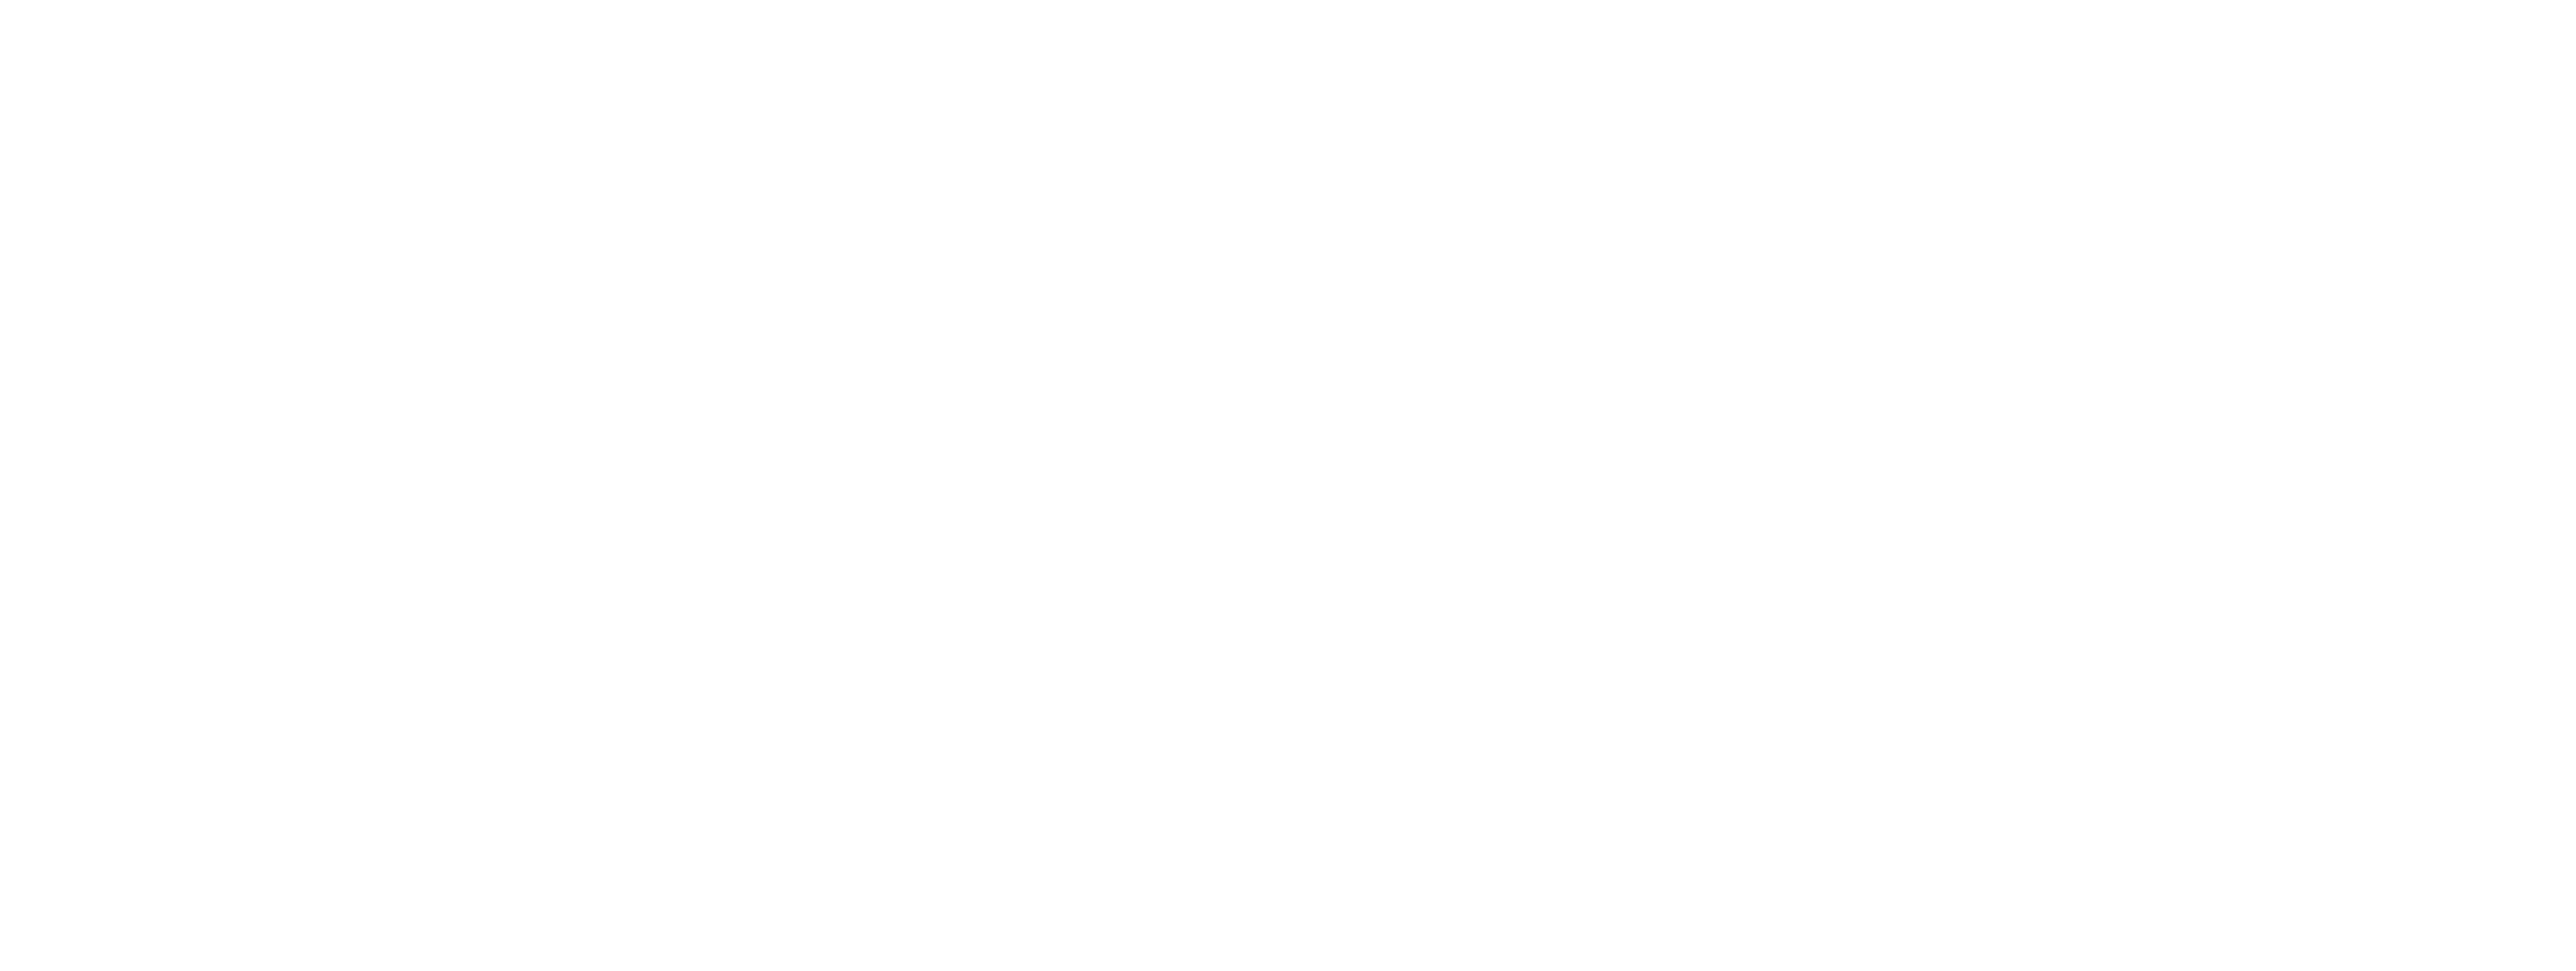 Yoga & Music BC